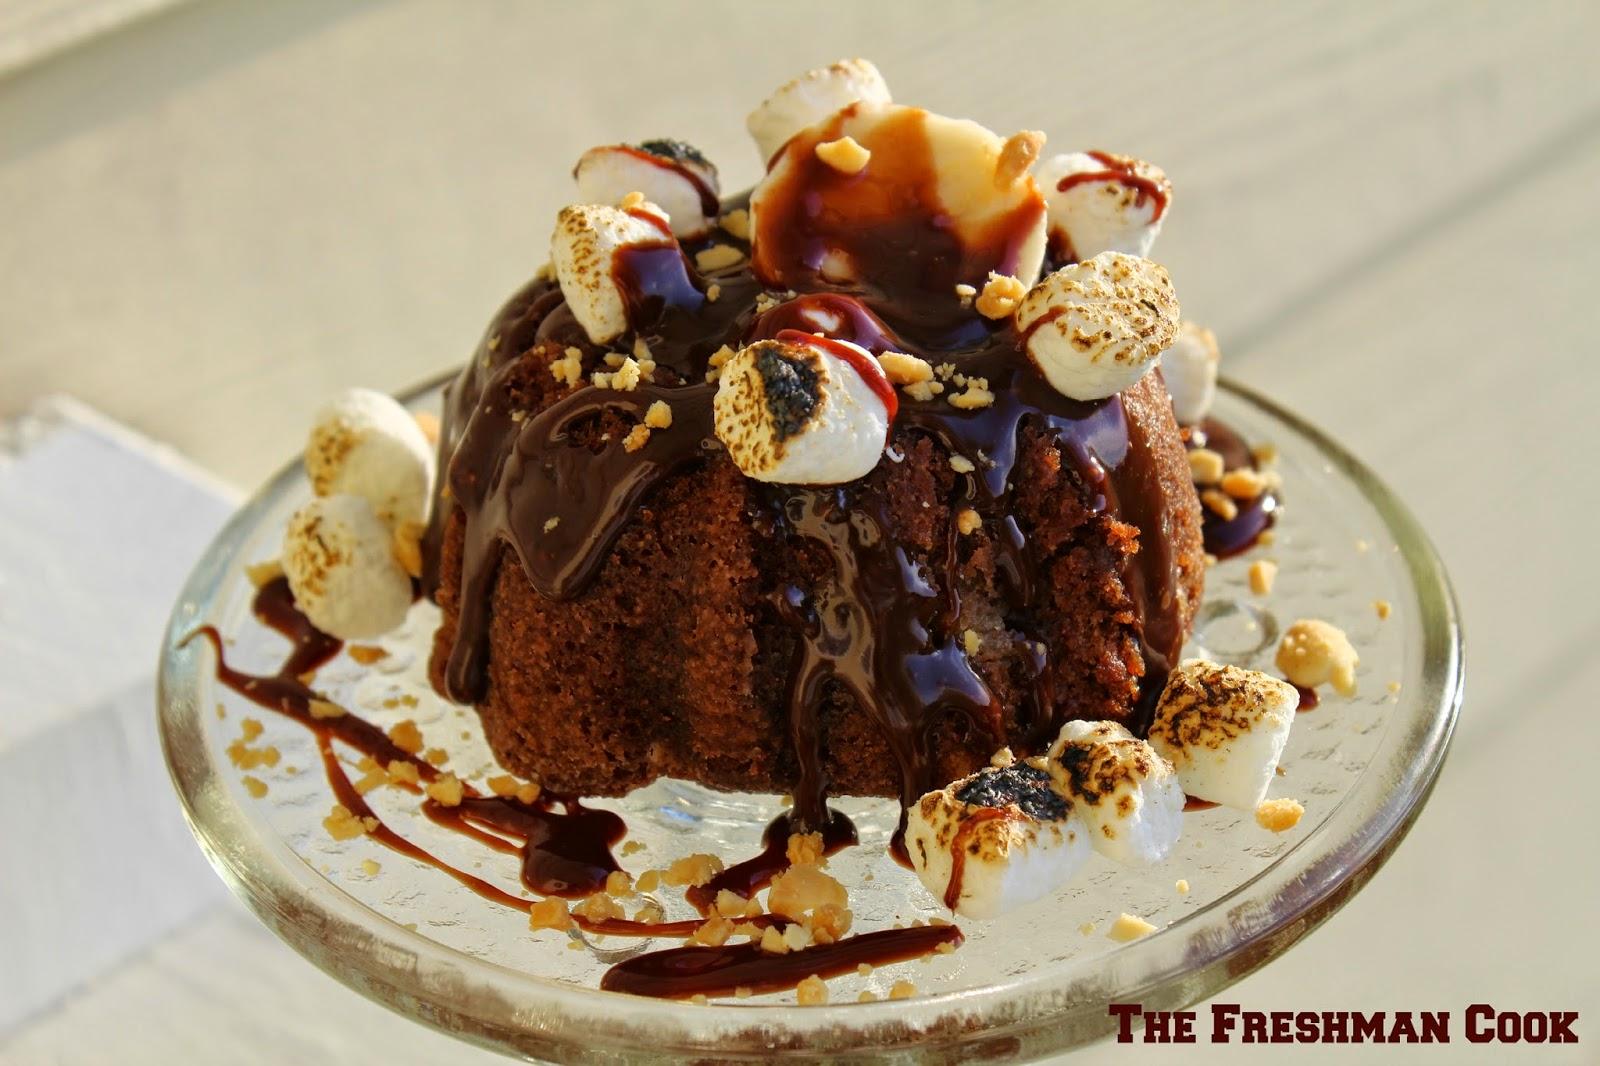 The Freshman Cook: Nutty Chocolate Banana Bundt Cake/#BundtBakers